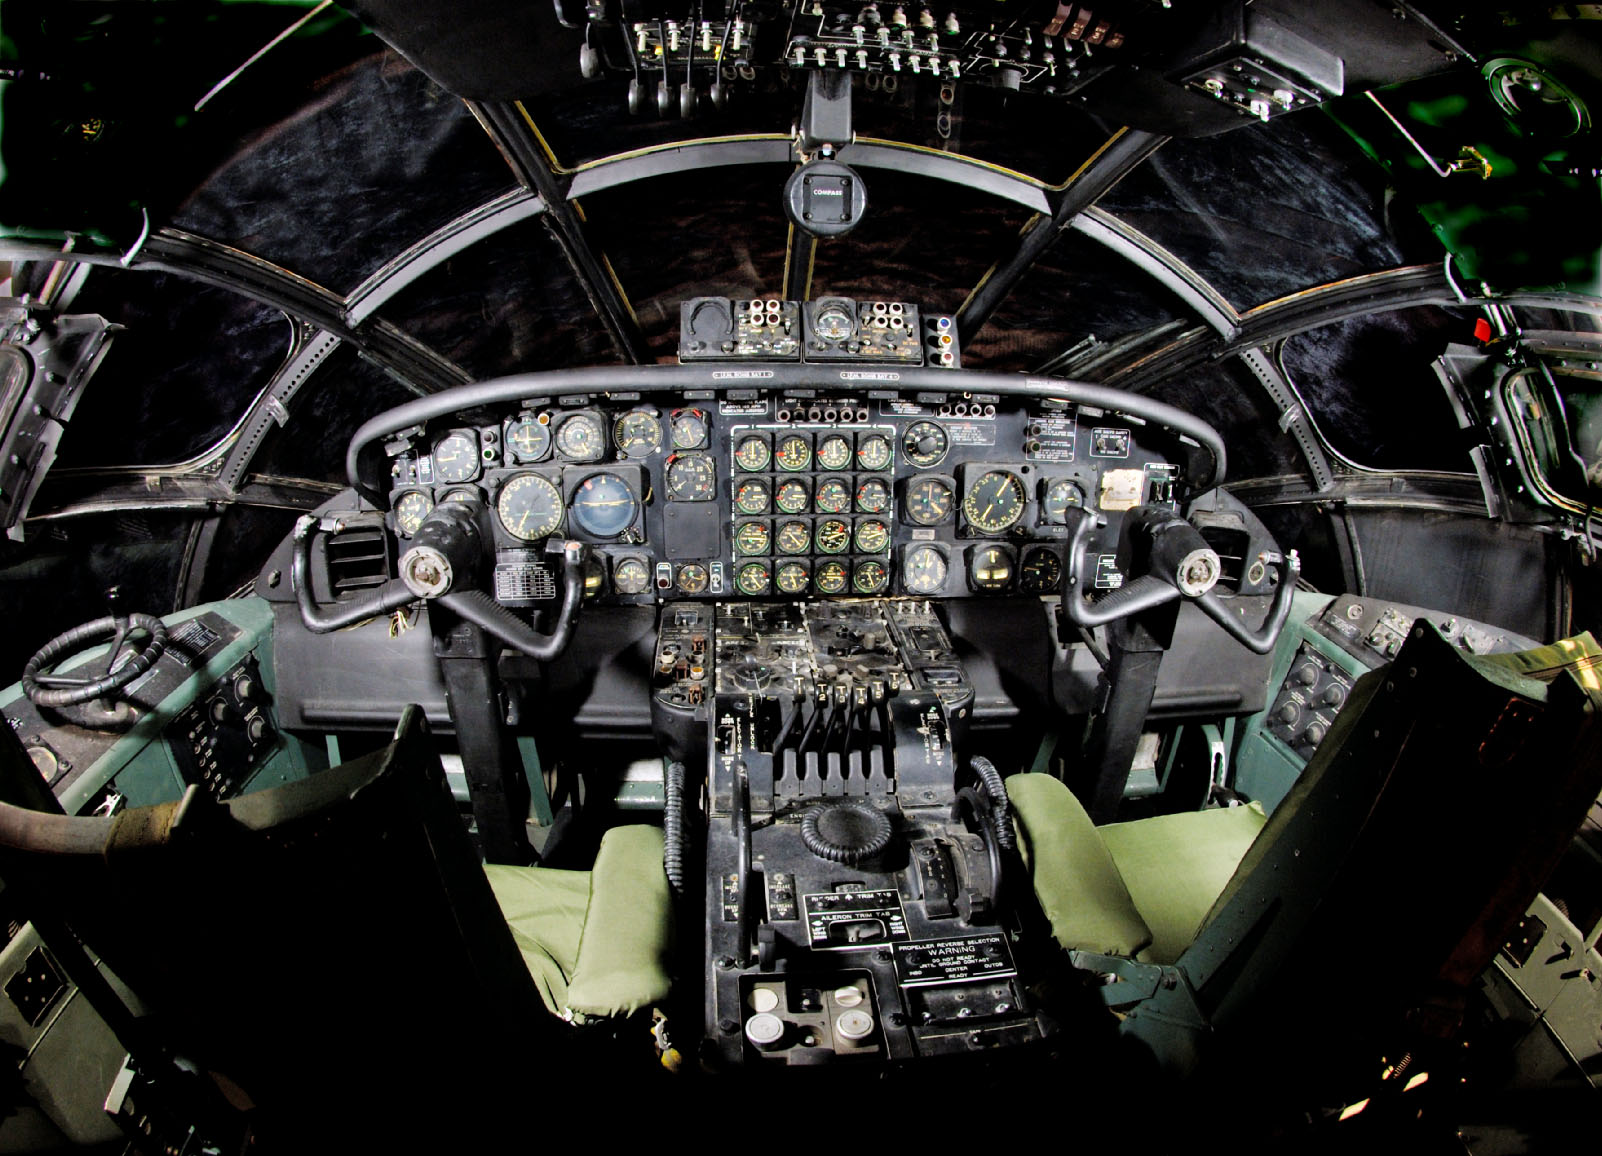 B 29 interior photos The Hindenburg's Interior: Passenger Decks t